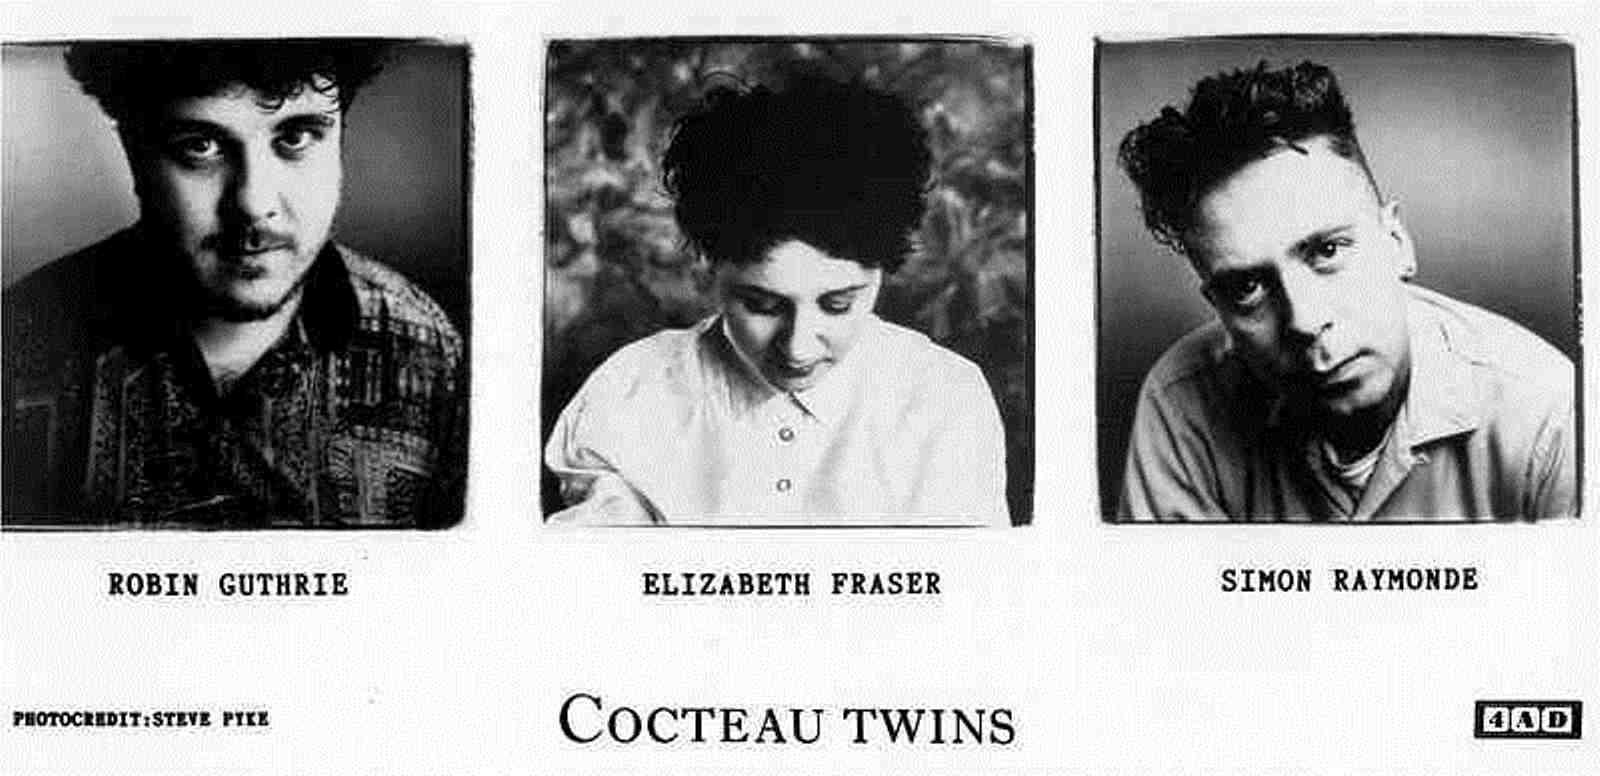 cocteau-twins.jpg